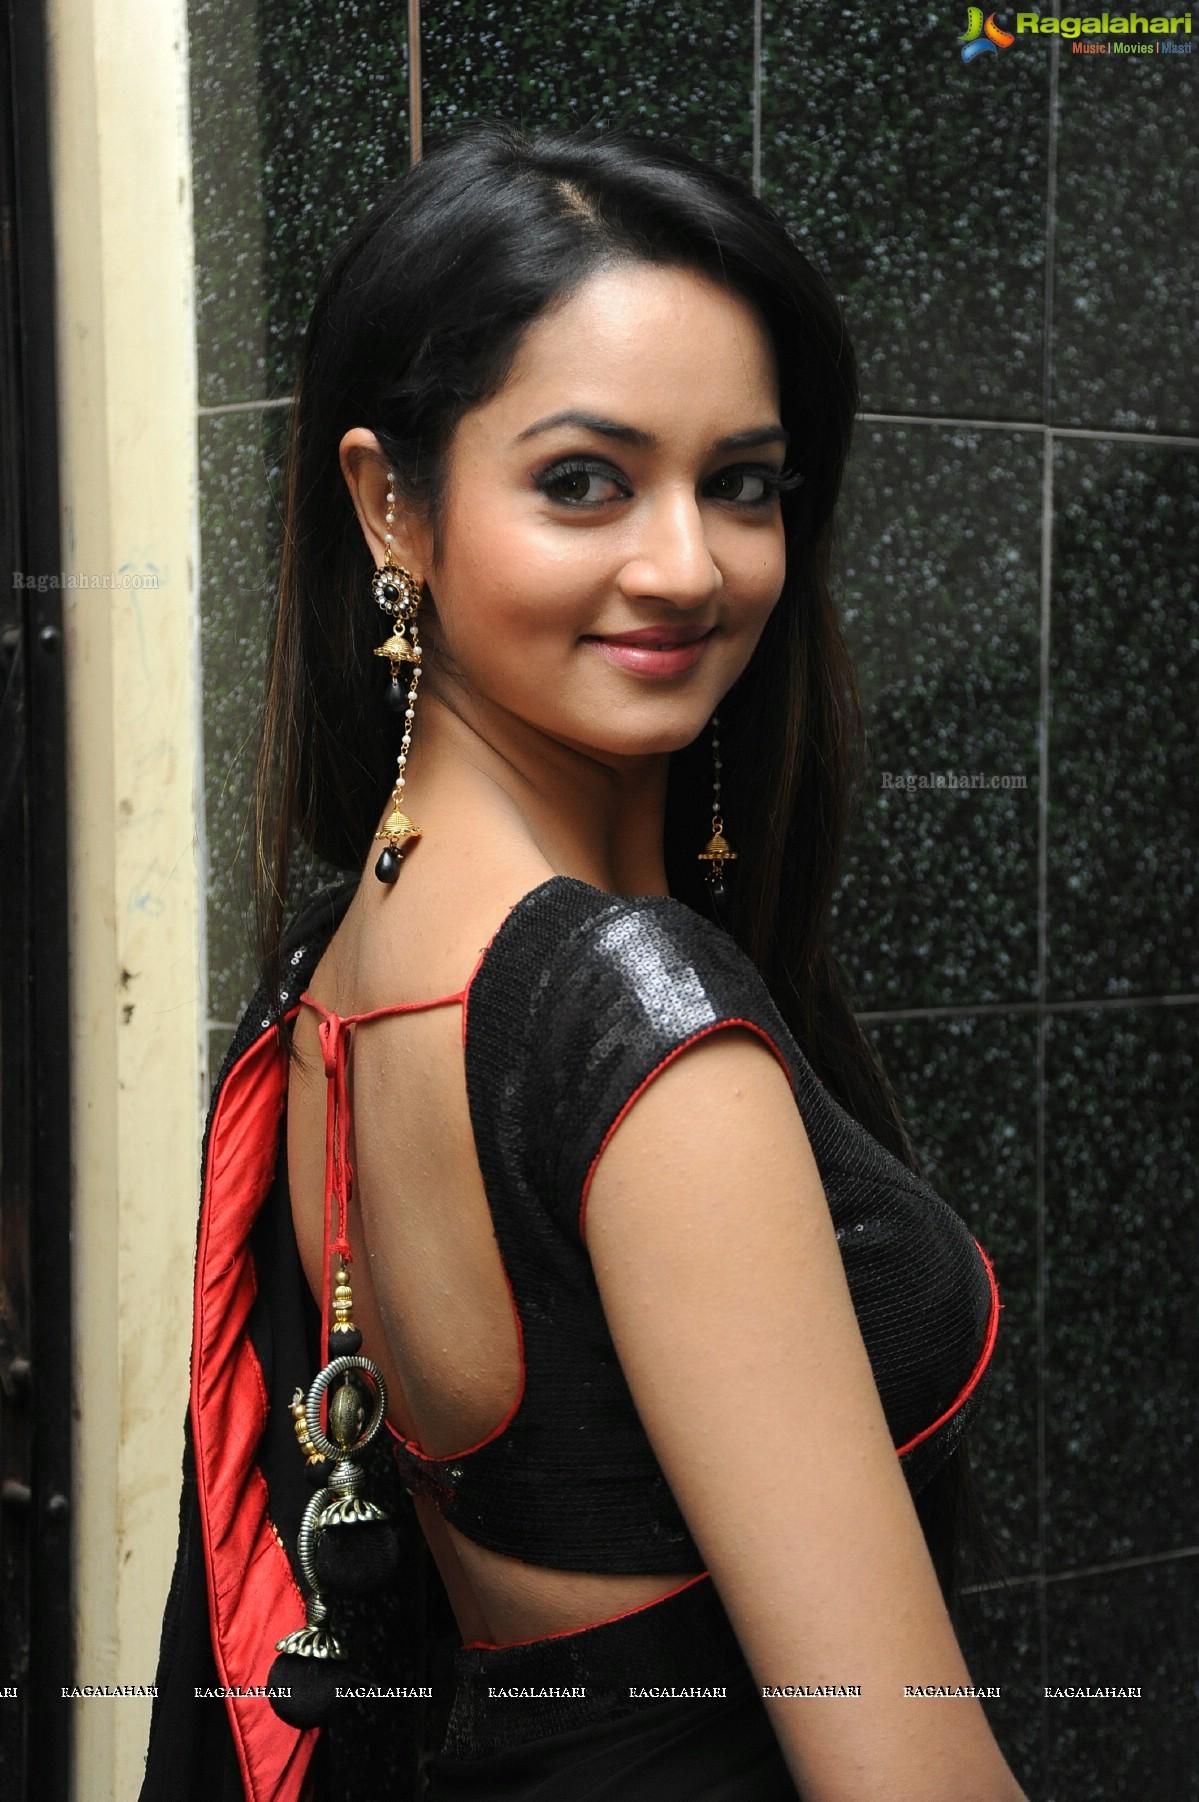 Shanvi Srivastava Image 21 Telugu Hero Galleryimages Photos